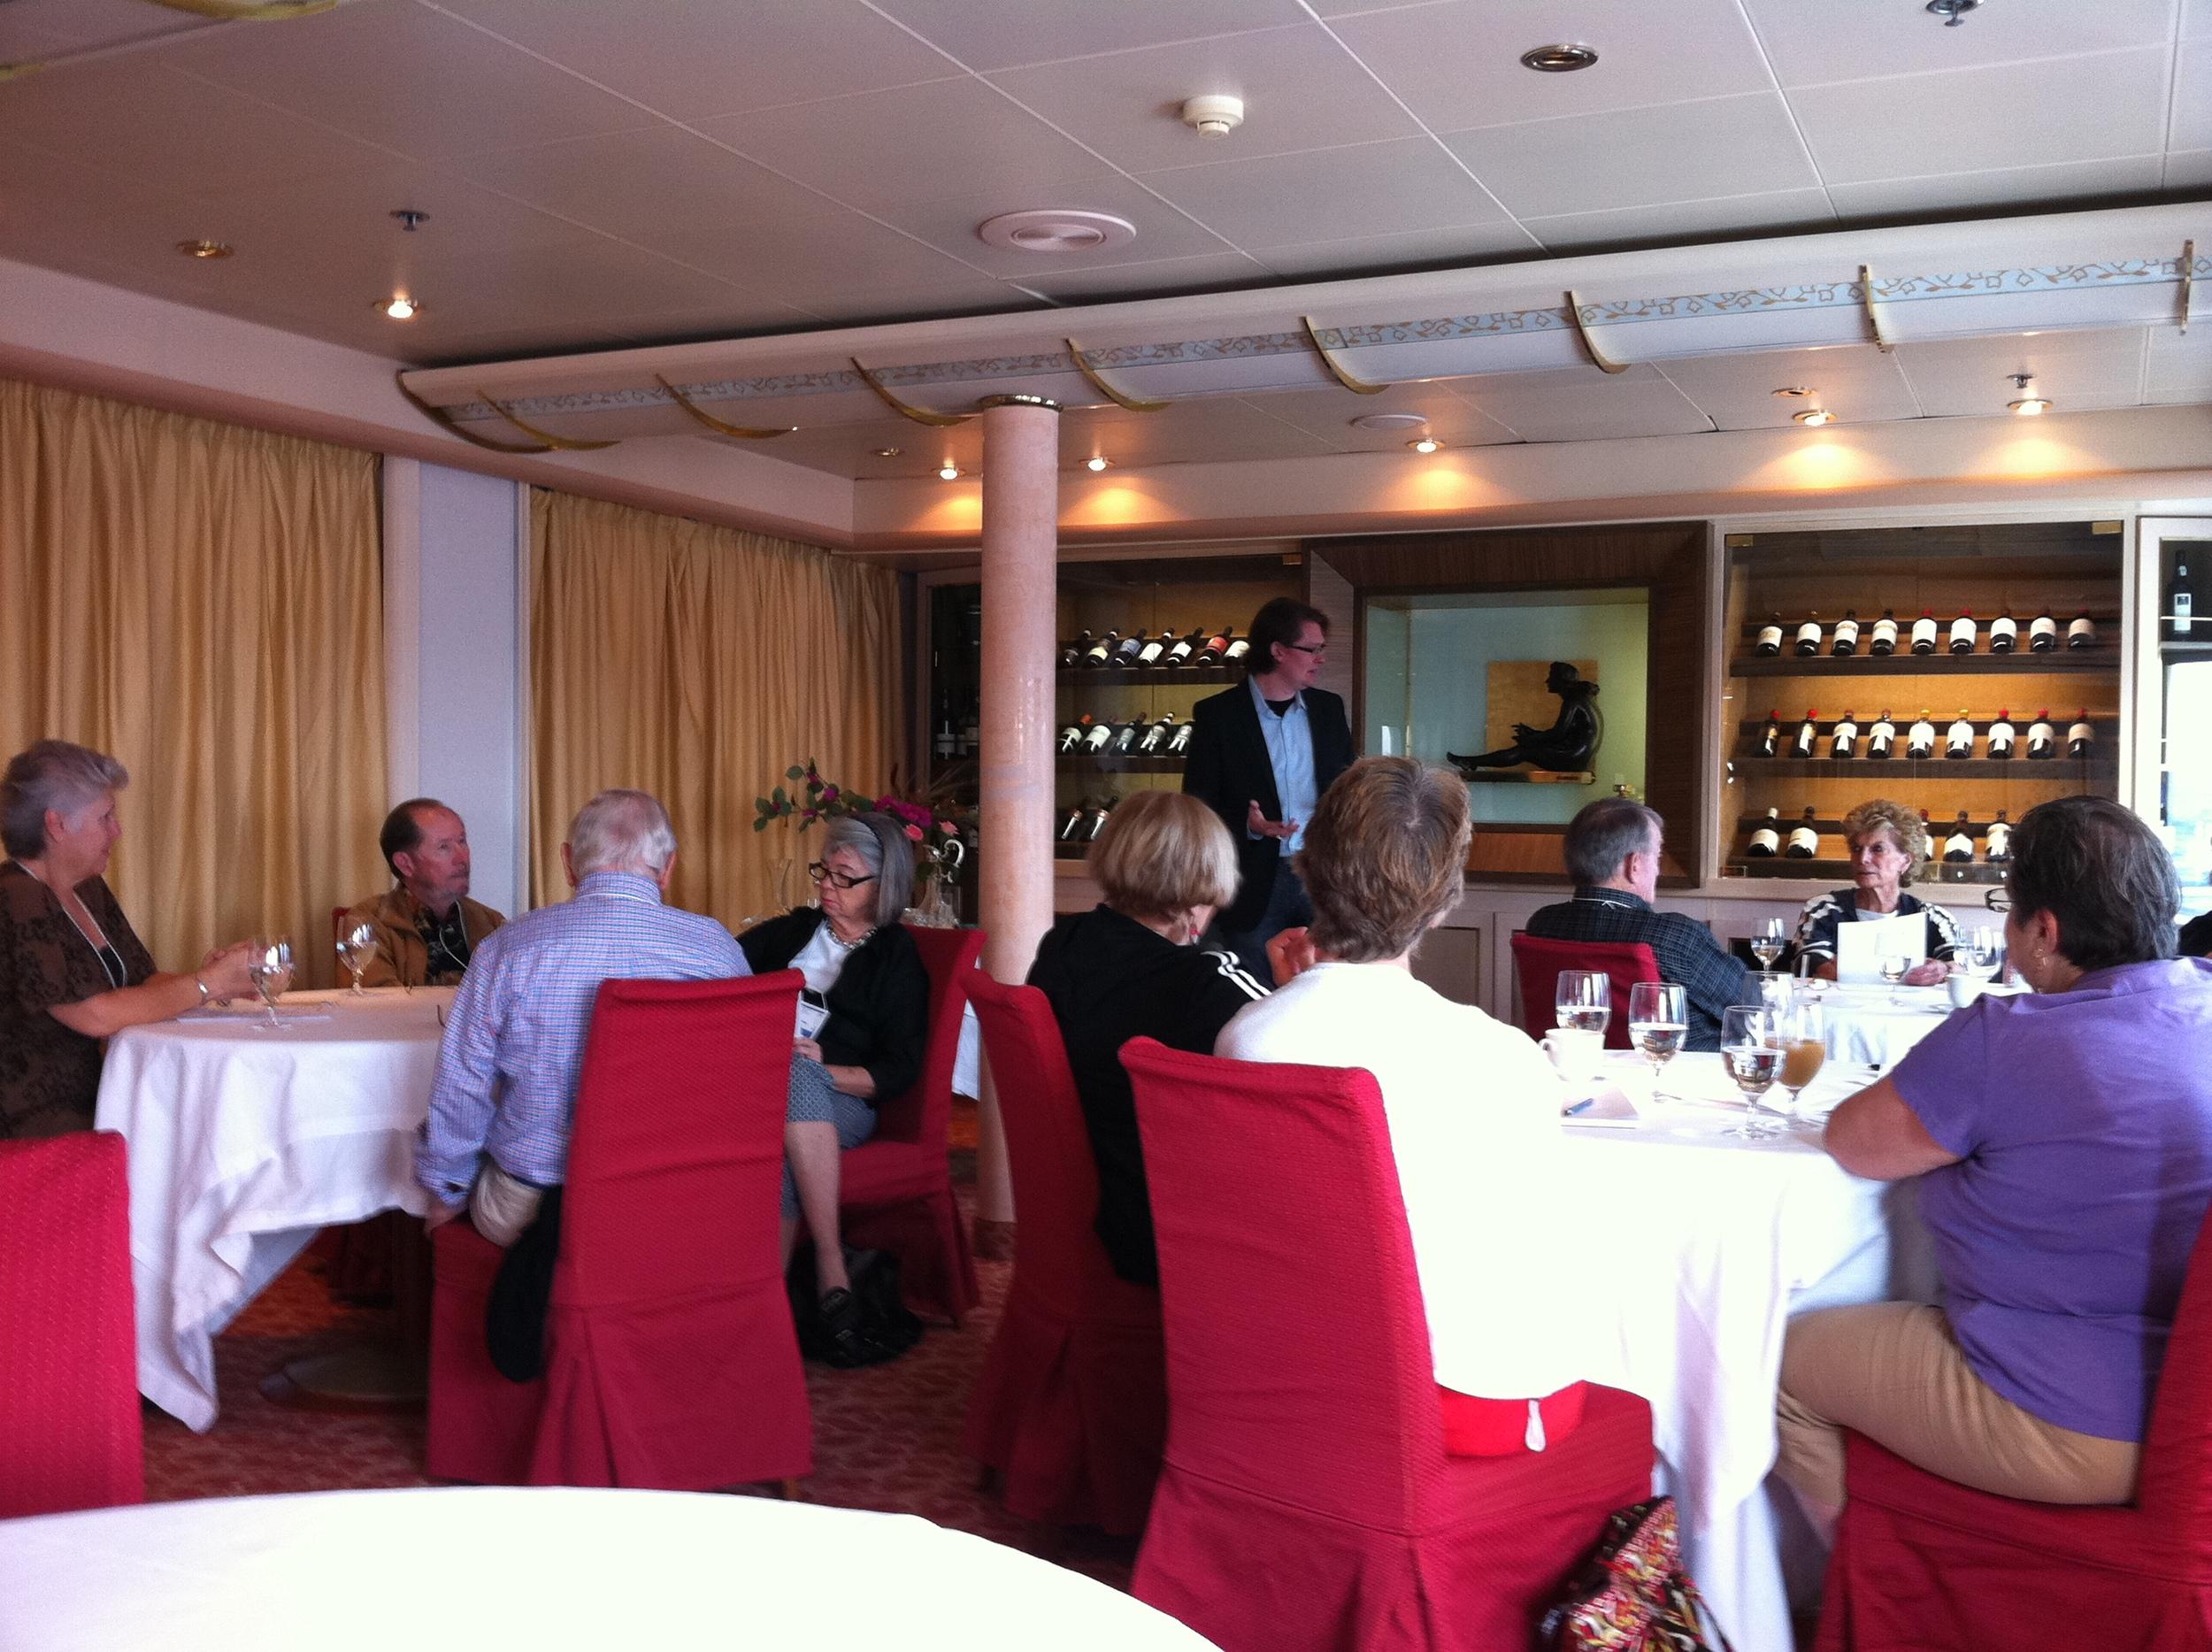 Robert Teaching, AiB Mediterranean Cruise - October 2011